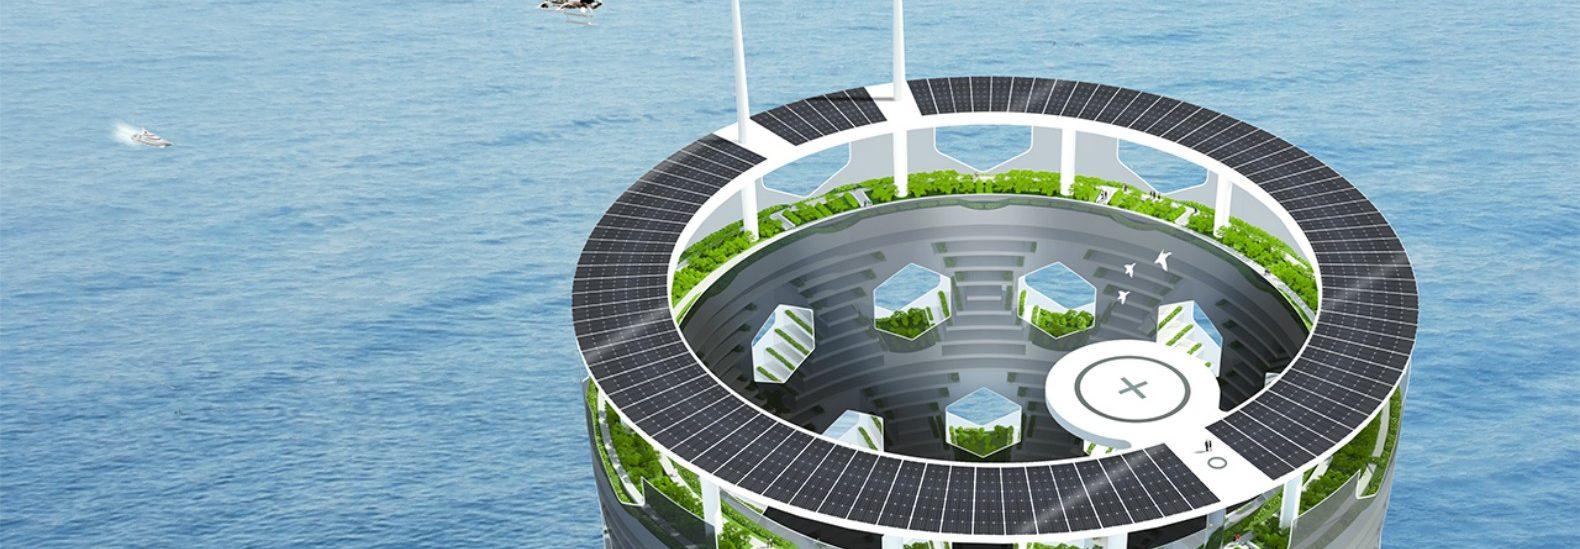 Solar Vertical City.jpg